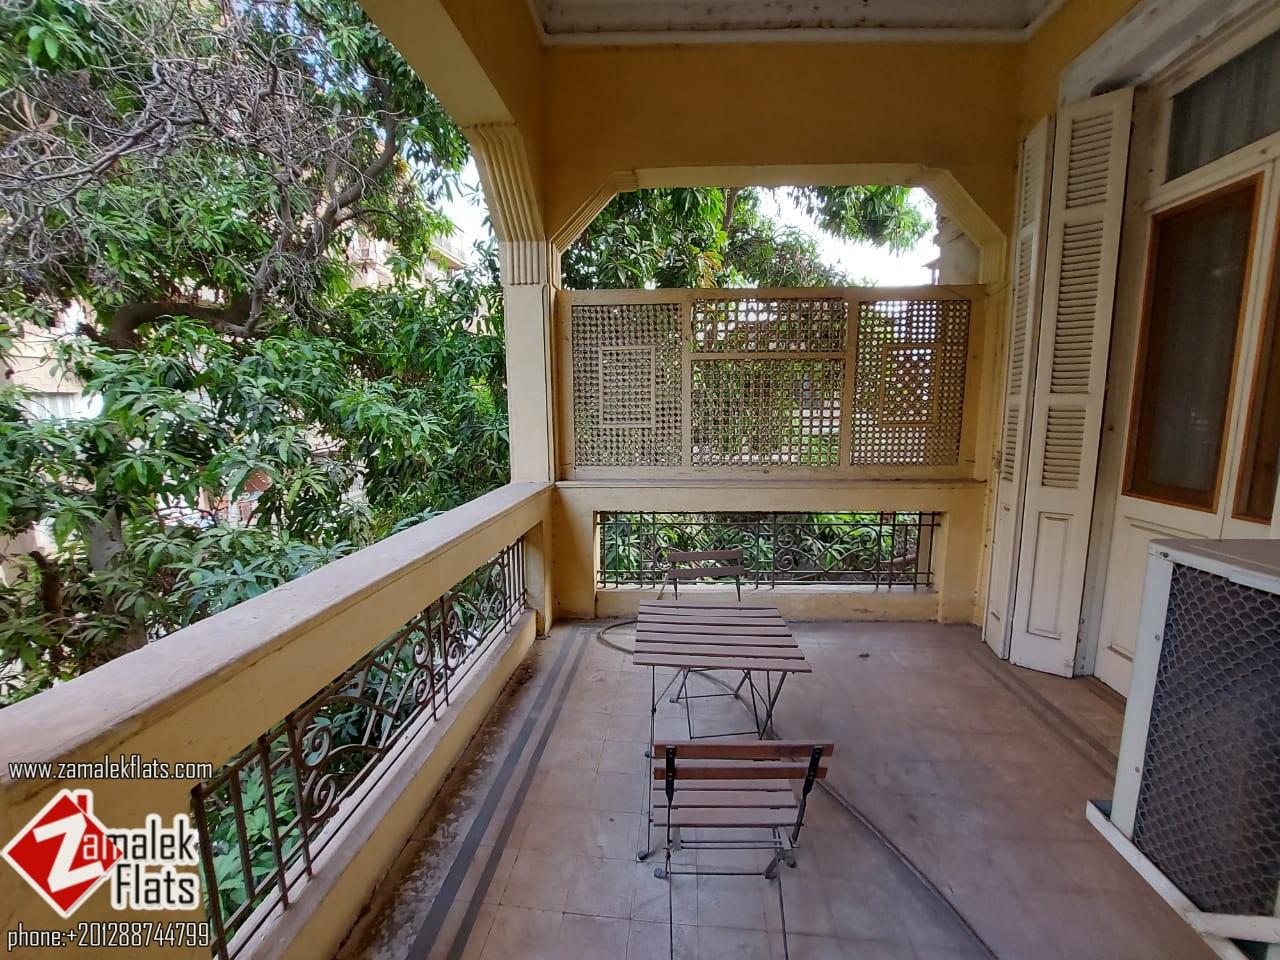 Fabulous Apartment For Rent In Zamalek